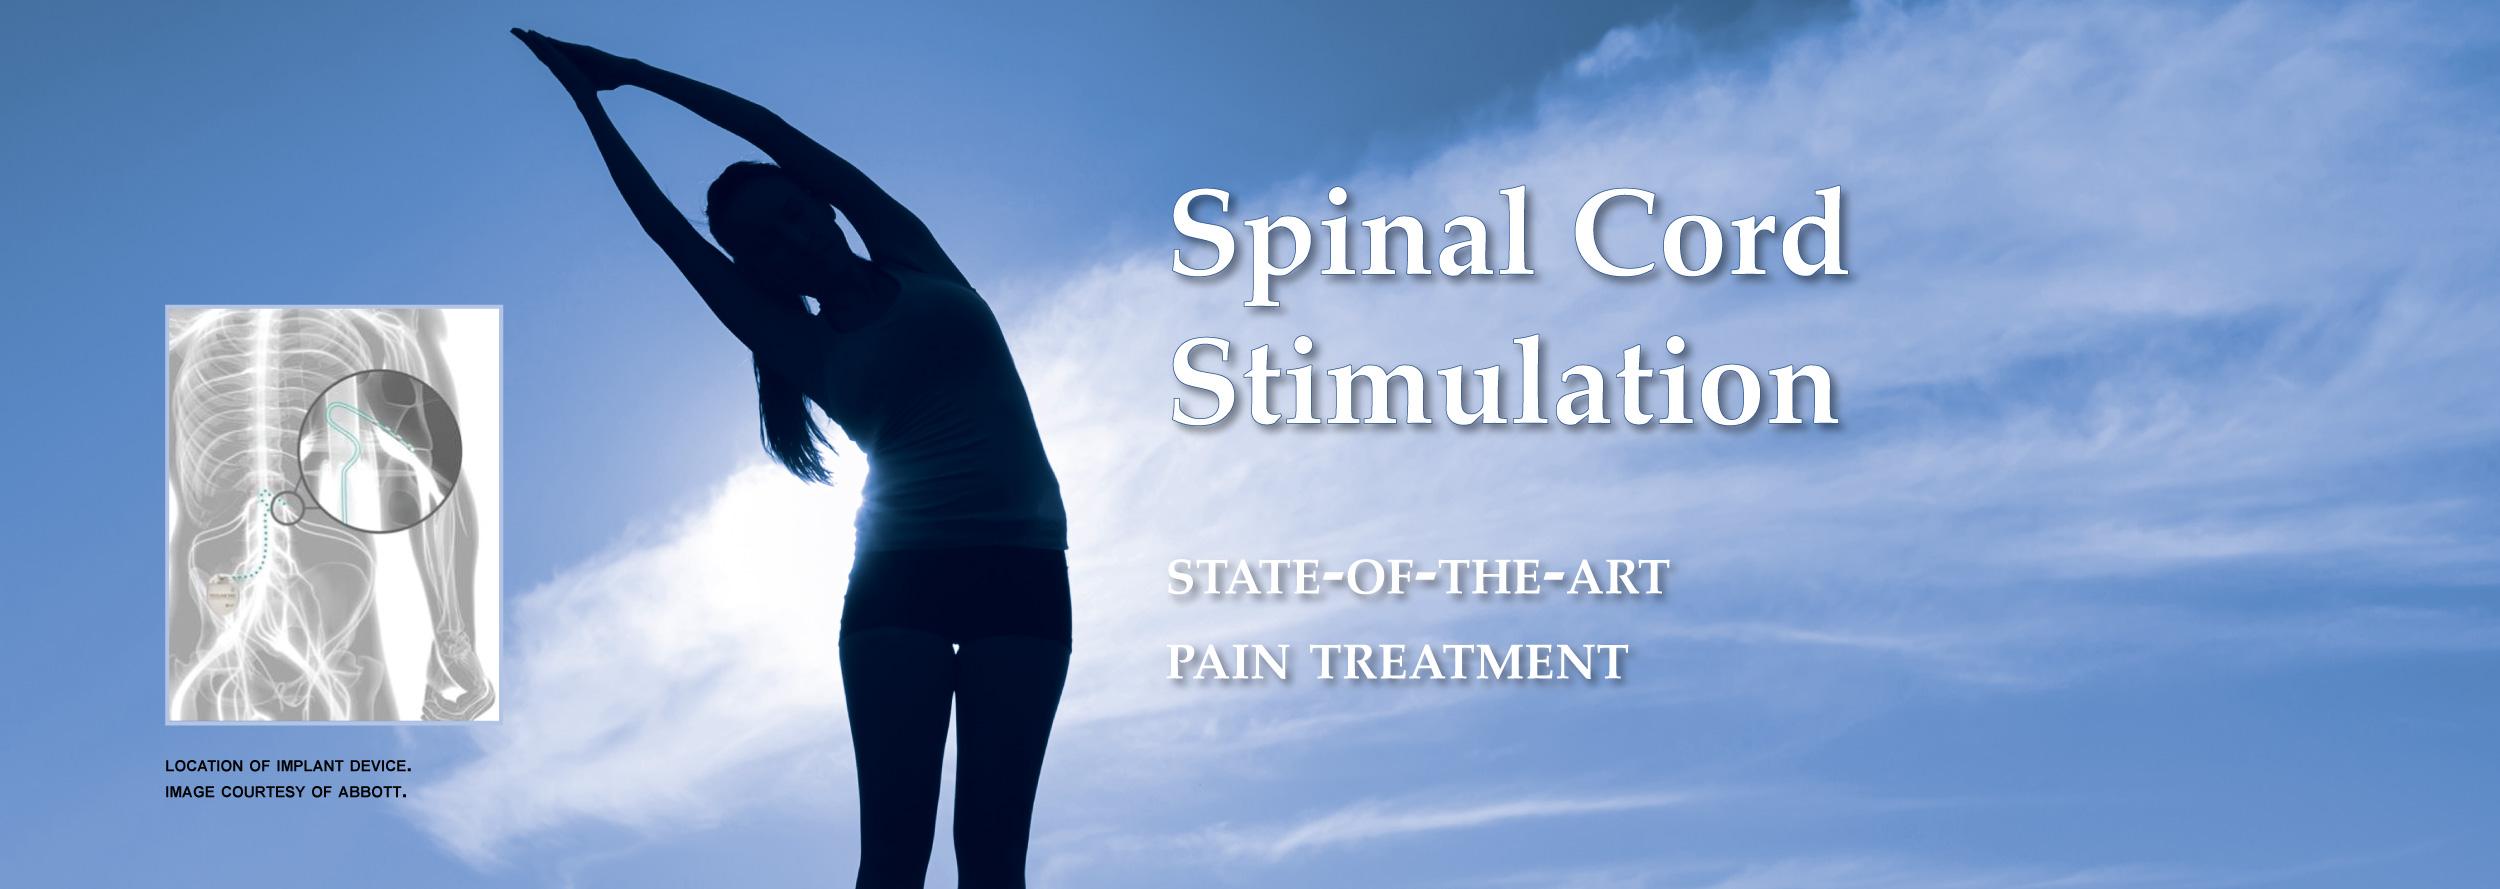 spinal-cord-stimulation-banner2.jpg